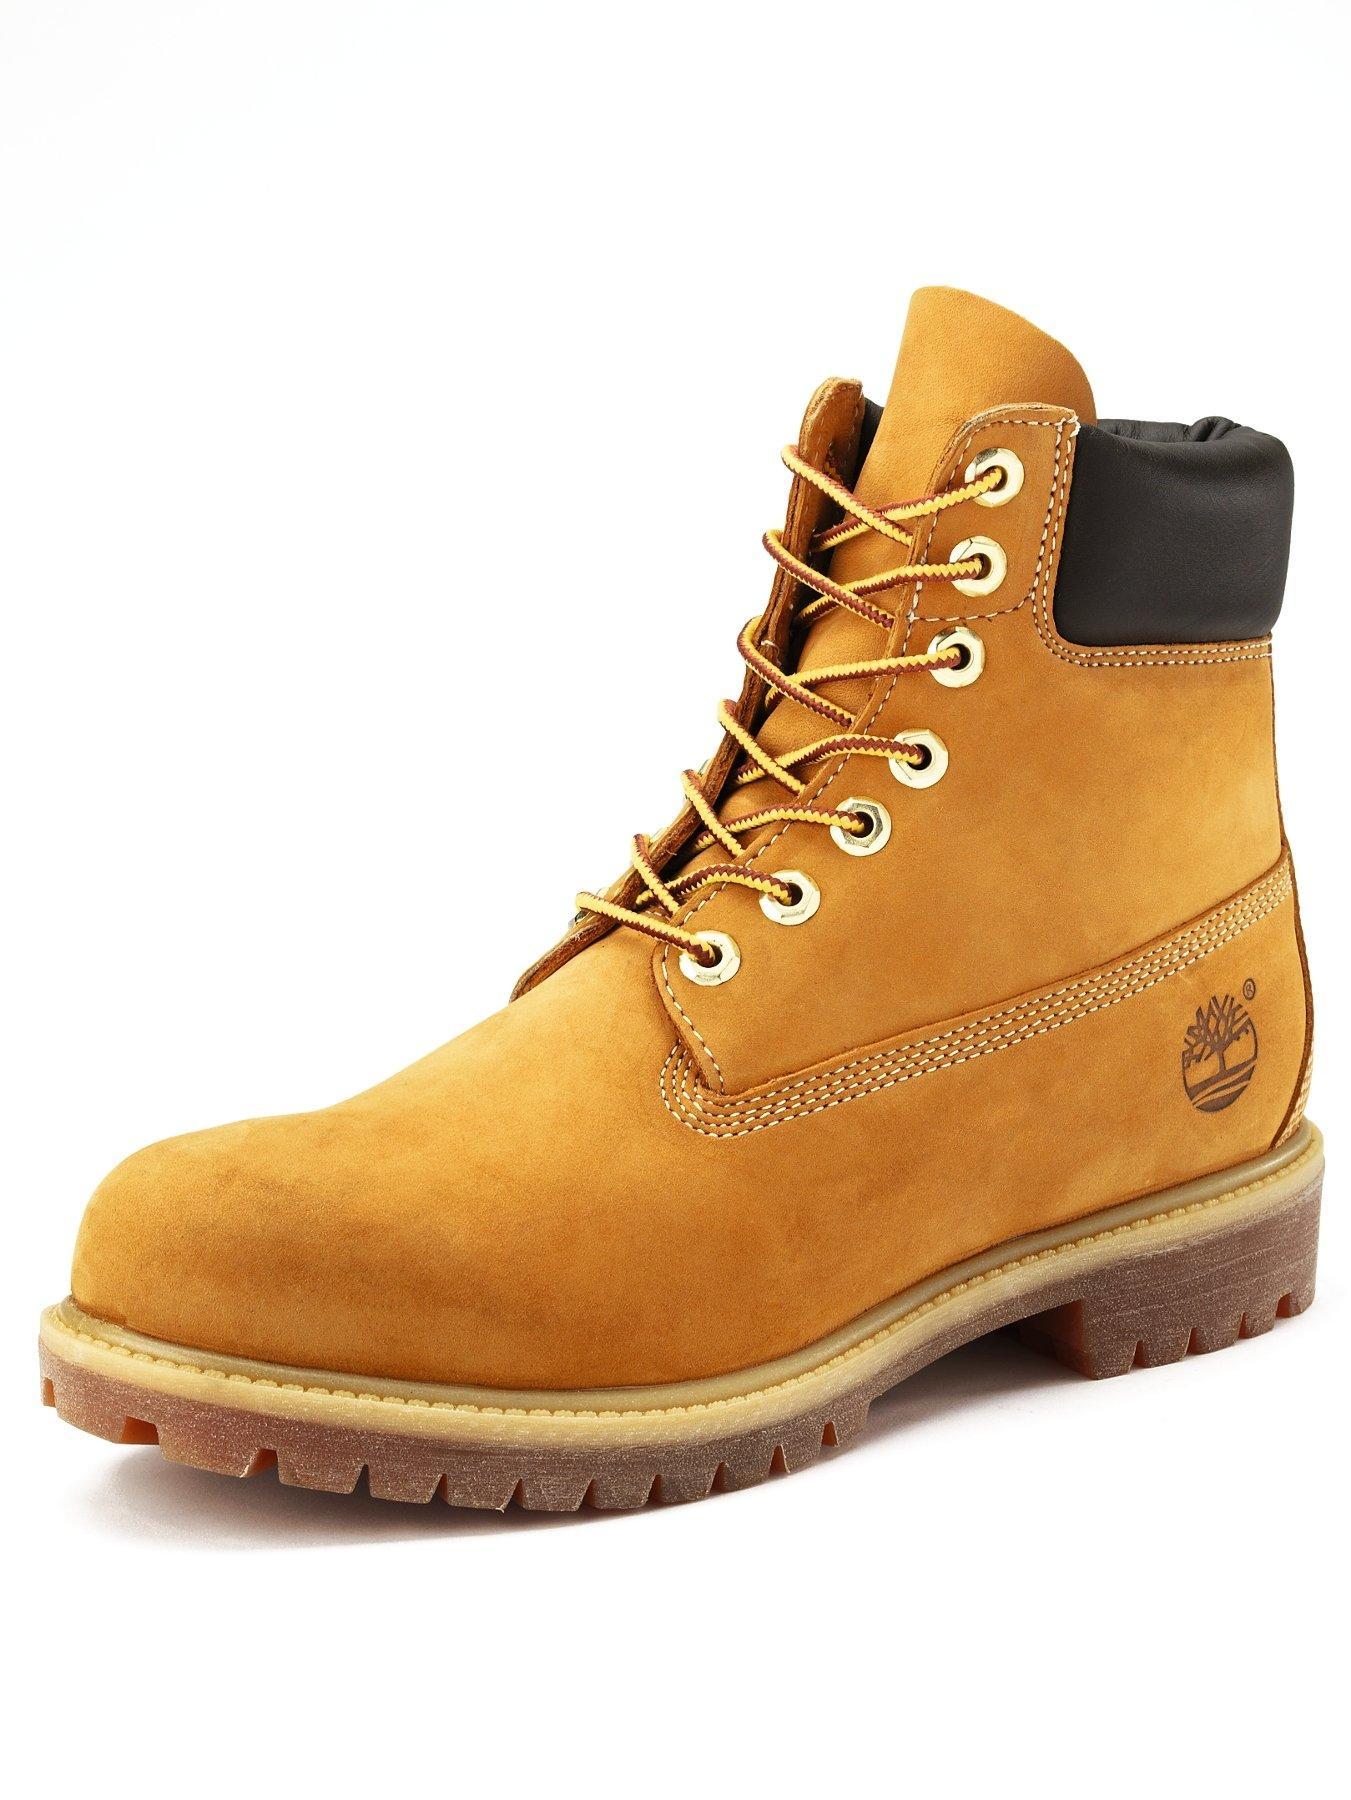 Timberland Boots | mens Timberland